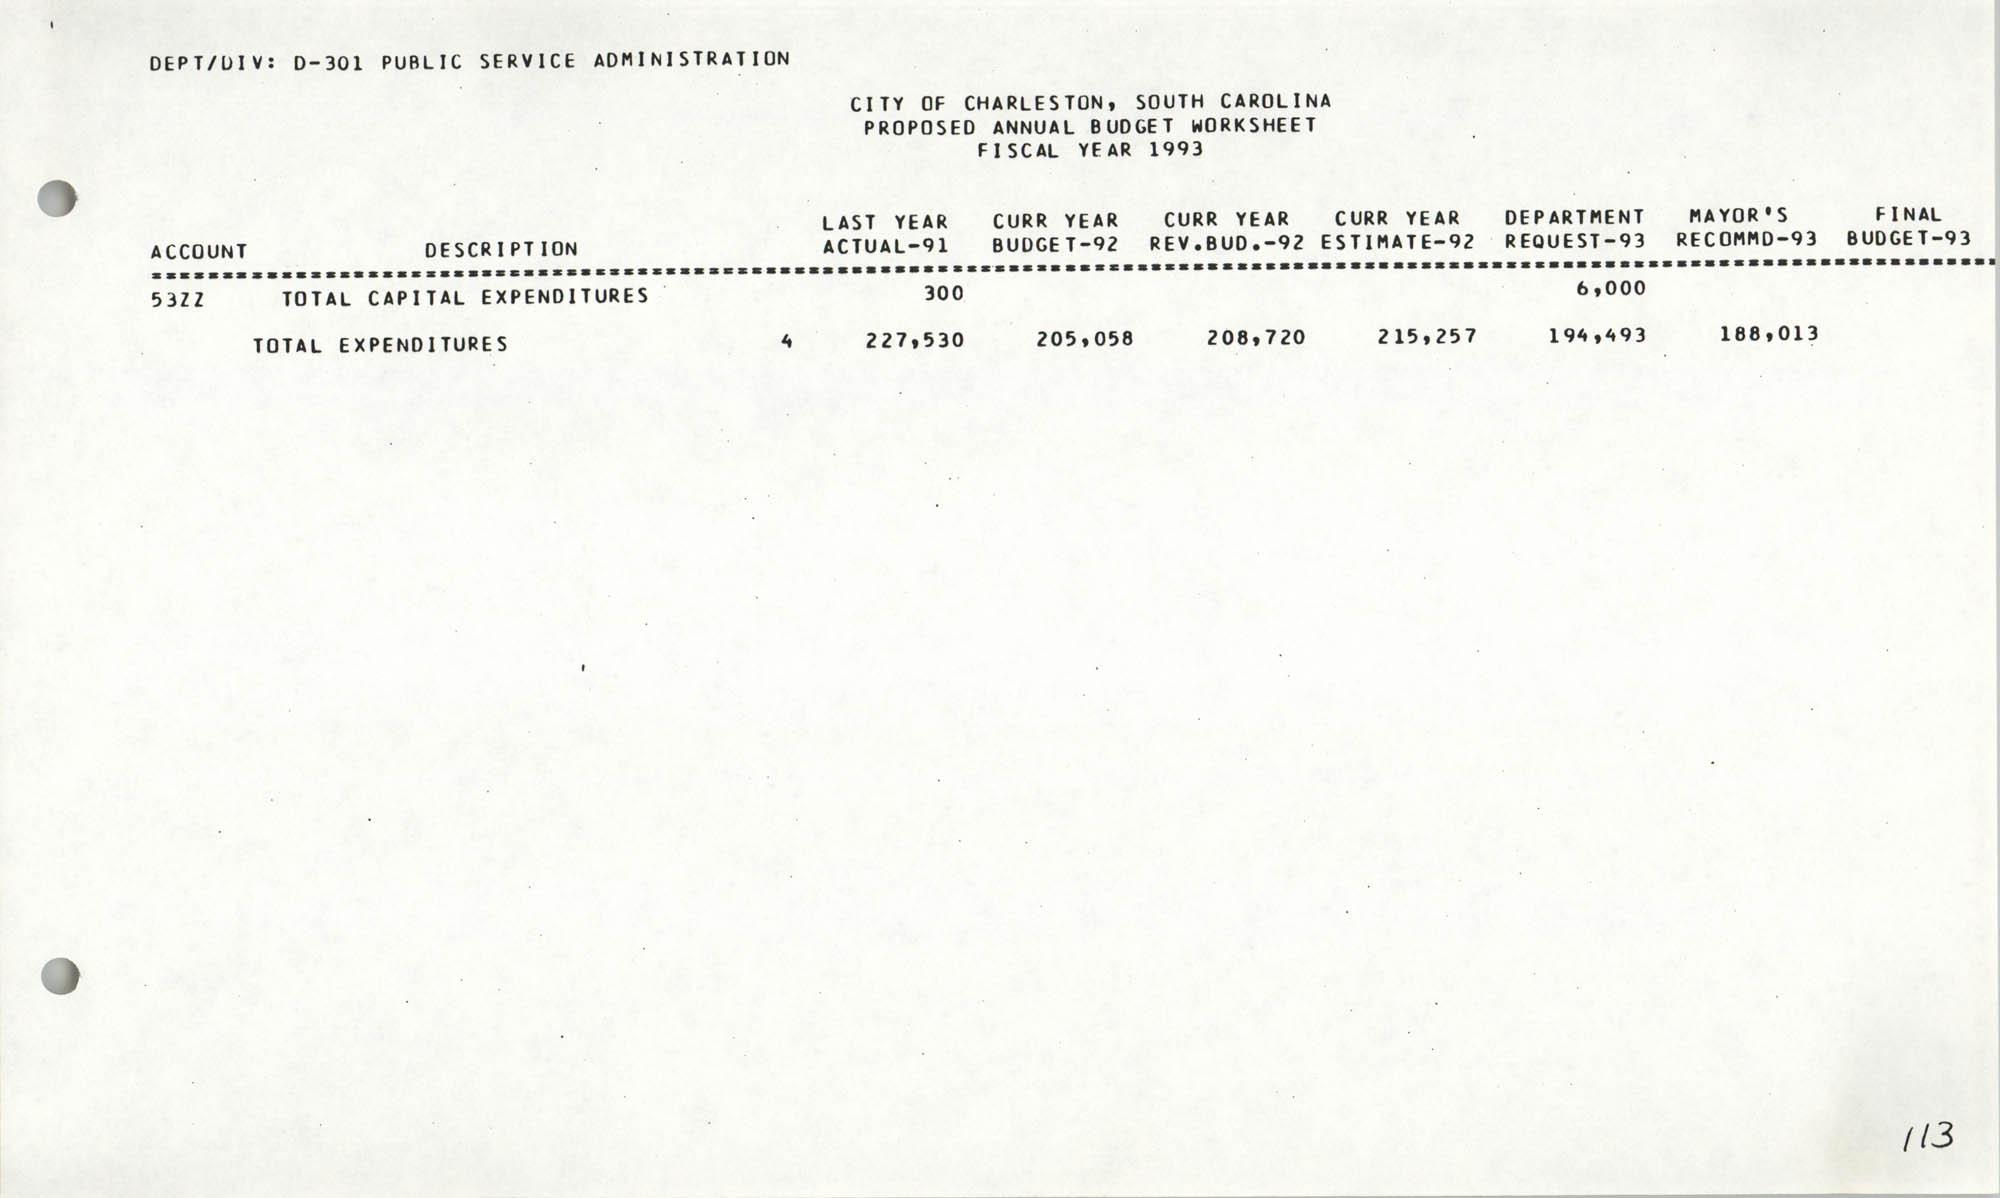 The City Council of Charleston, South Carolina, 1993 Budget, Page 113